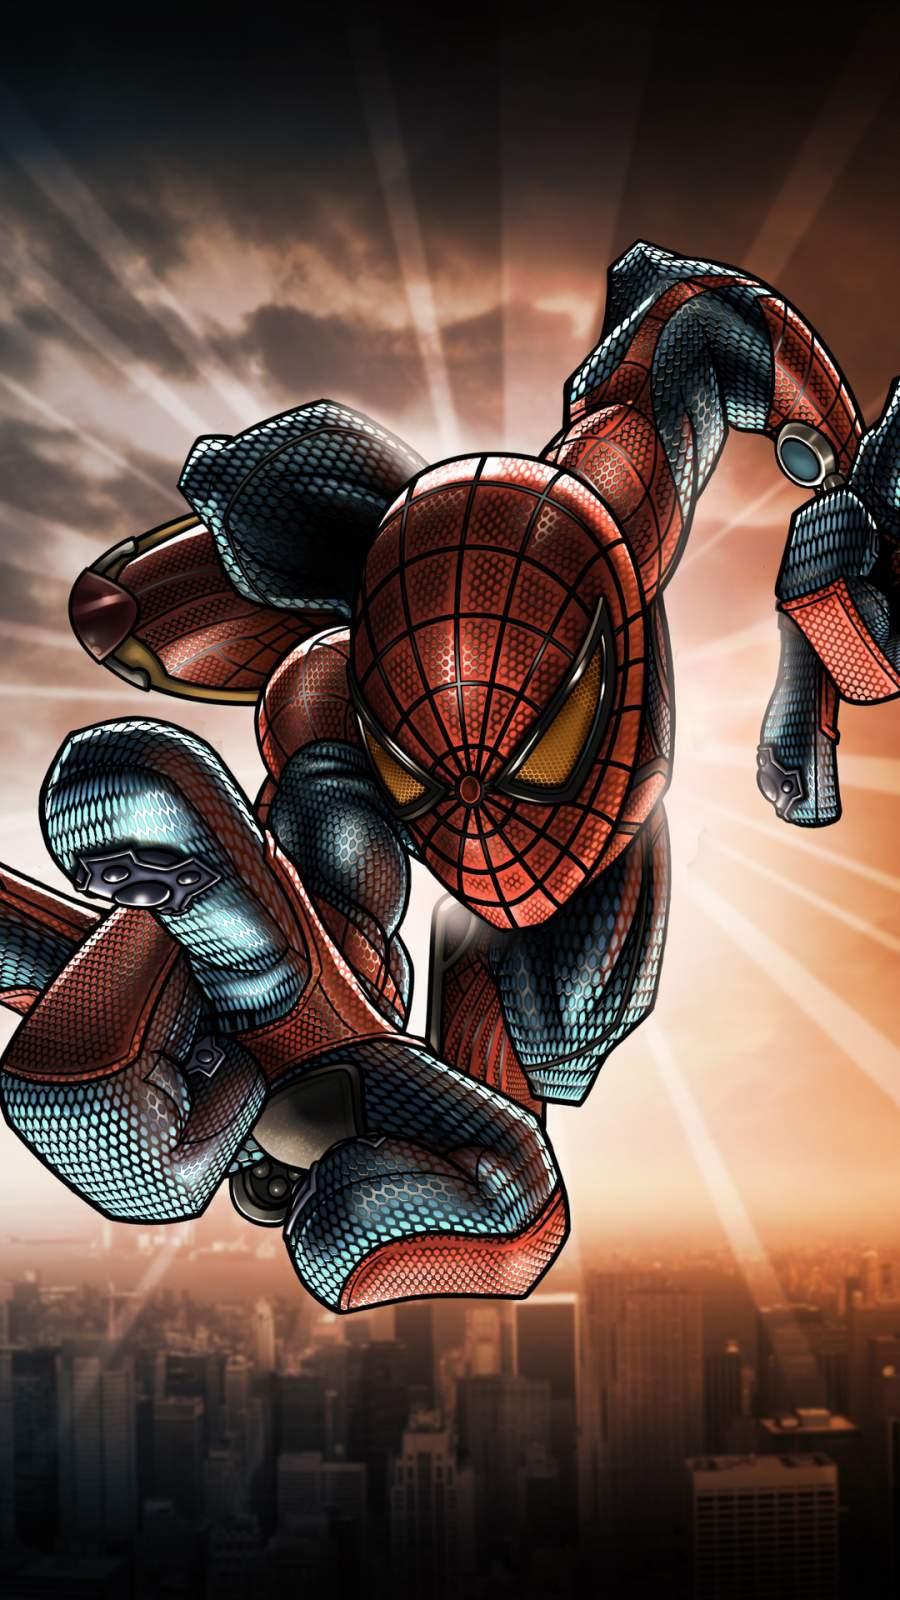 Amazing Spiderman Artwork